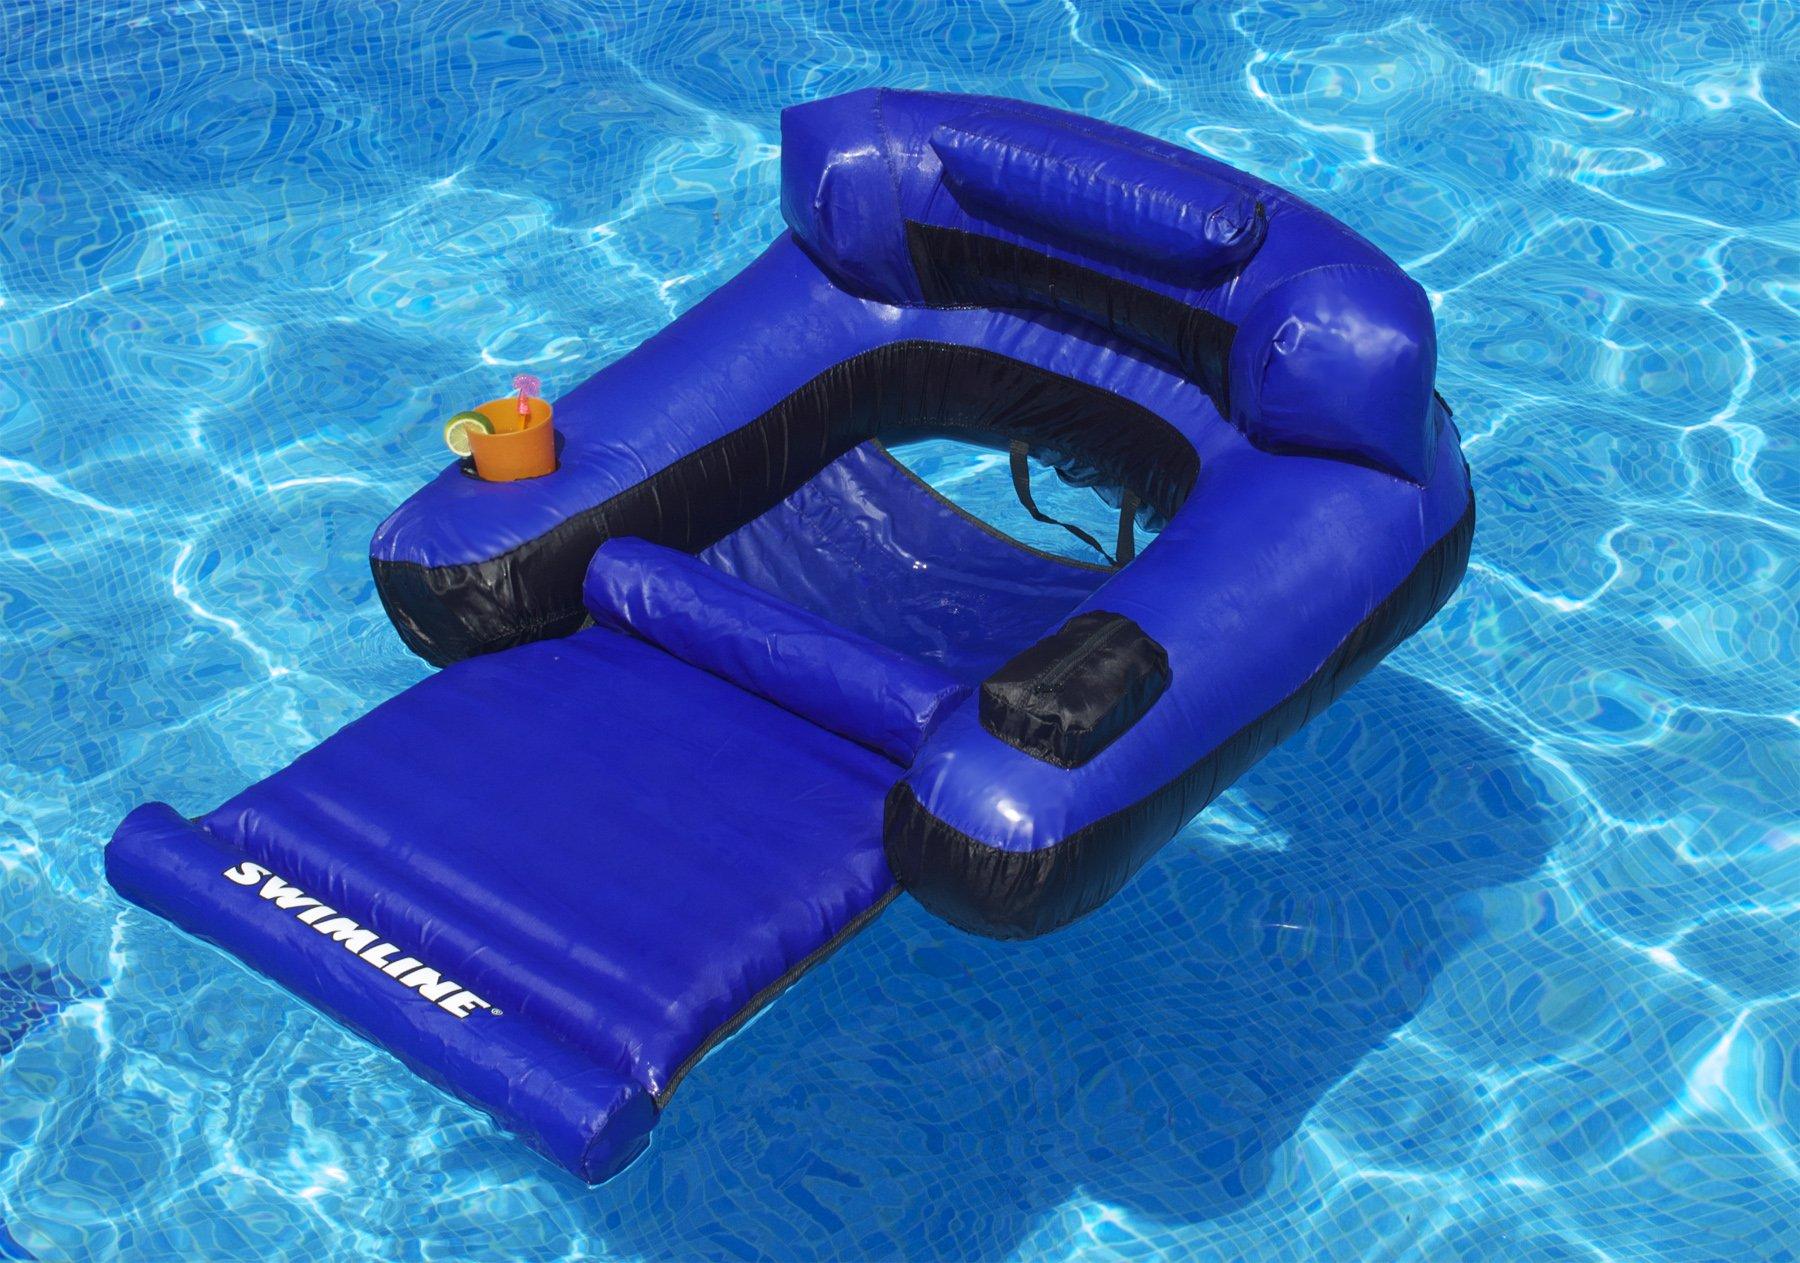 Swimline 9047 Floating Lounge Chair